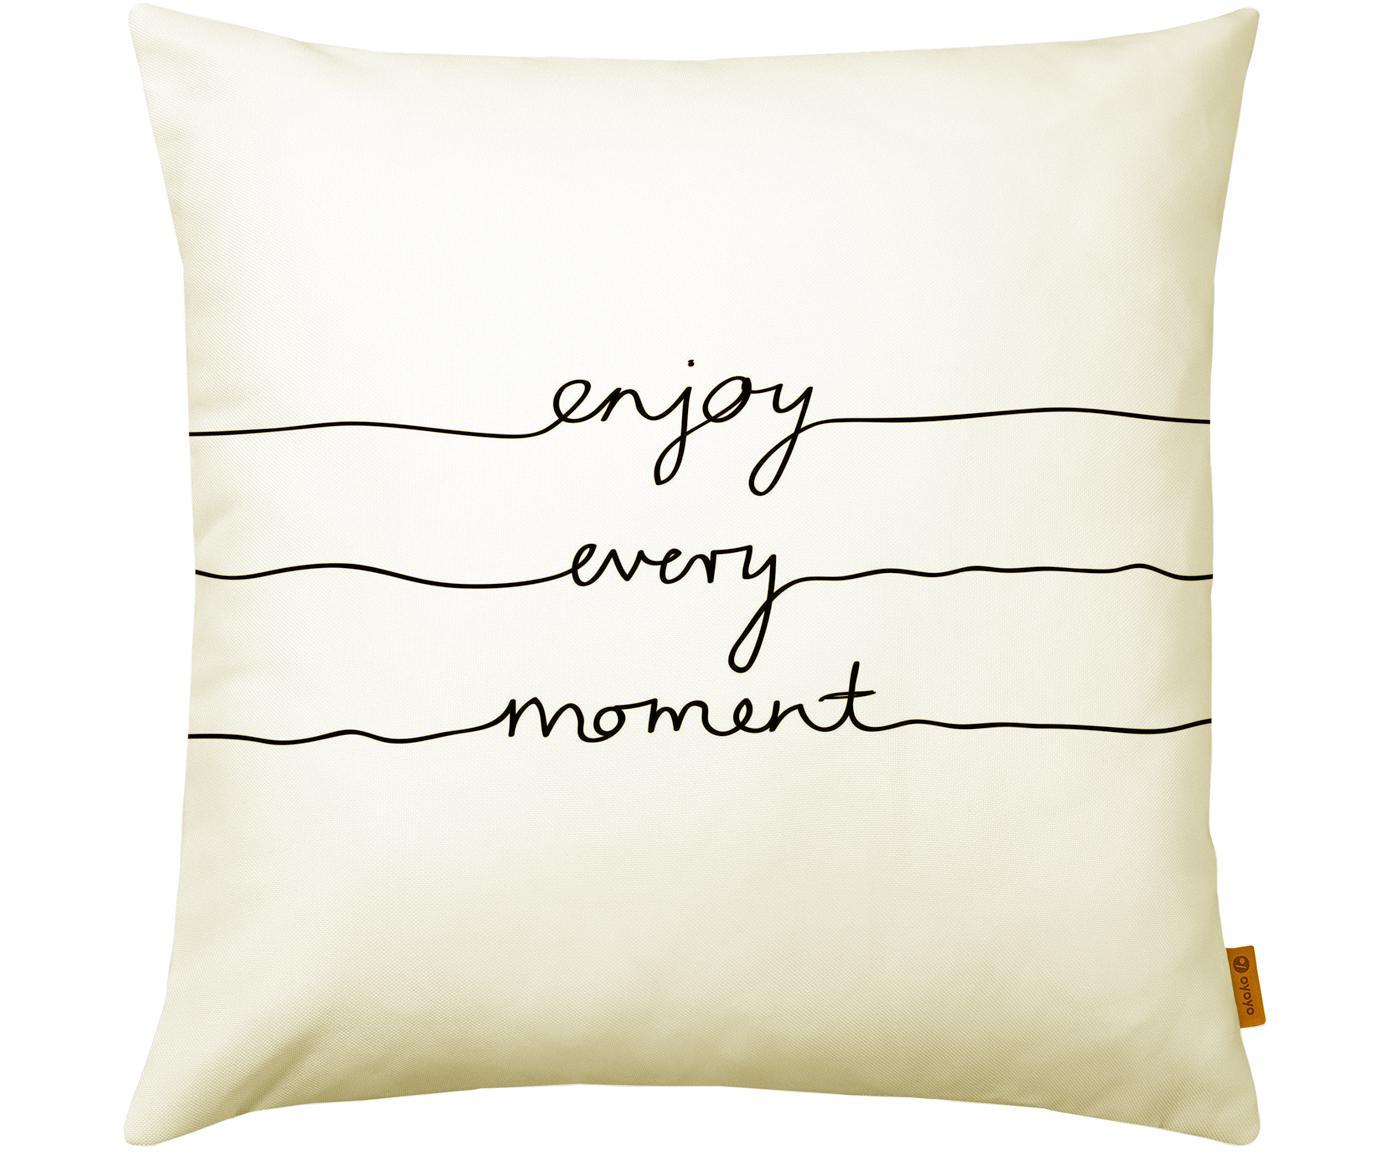 Federa Enjoy Every Moment con scritta in nero/bianco, Poliestere, Bianco, nero, Larg. 50 x Lung. 50 cm